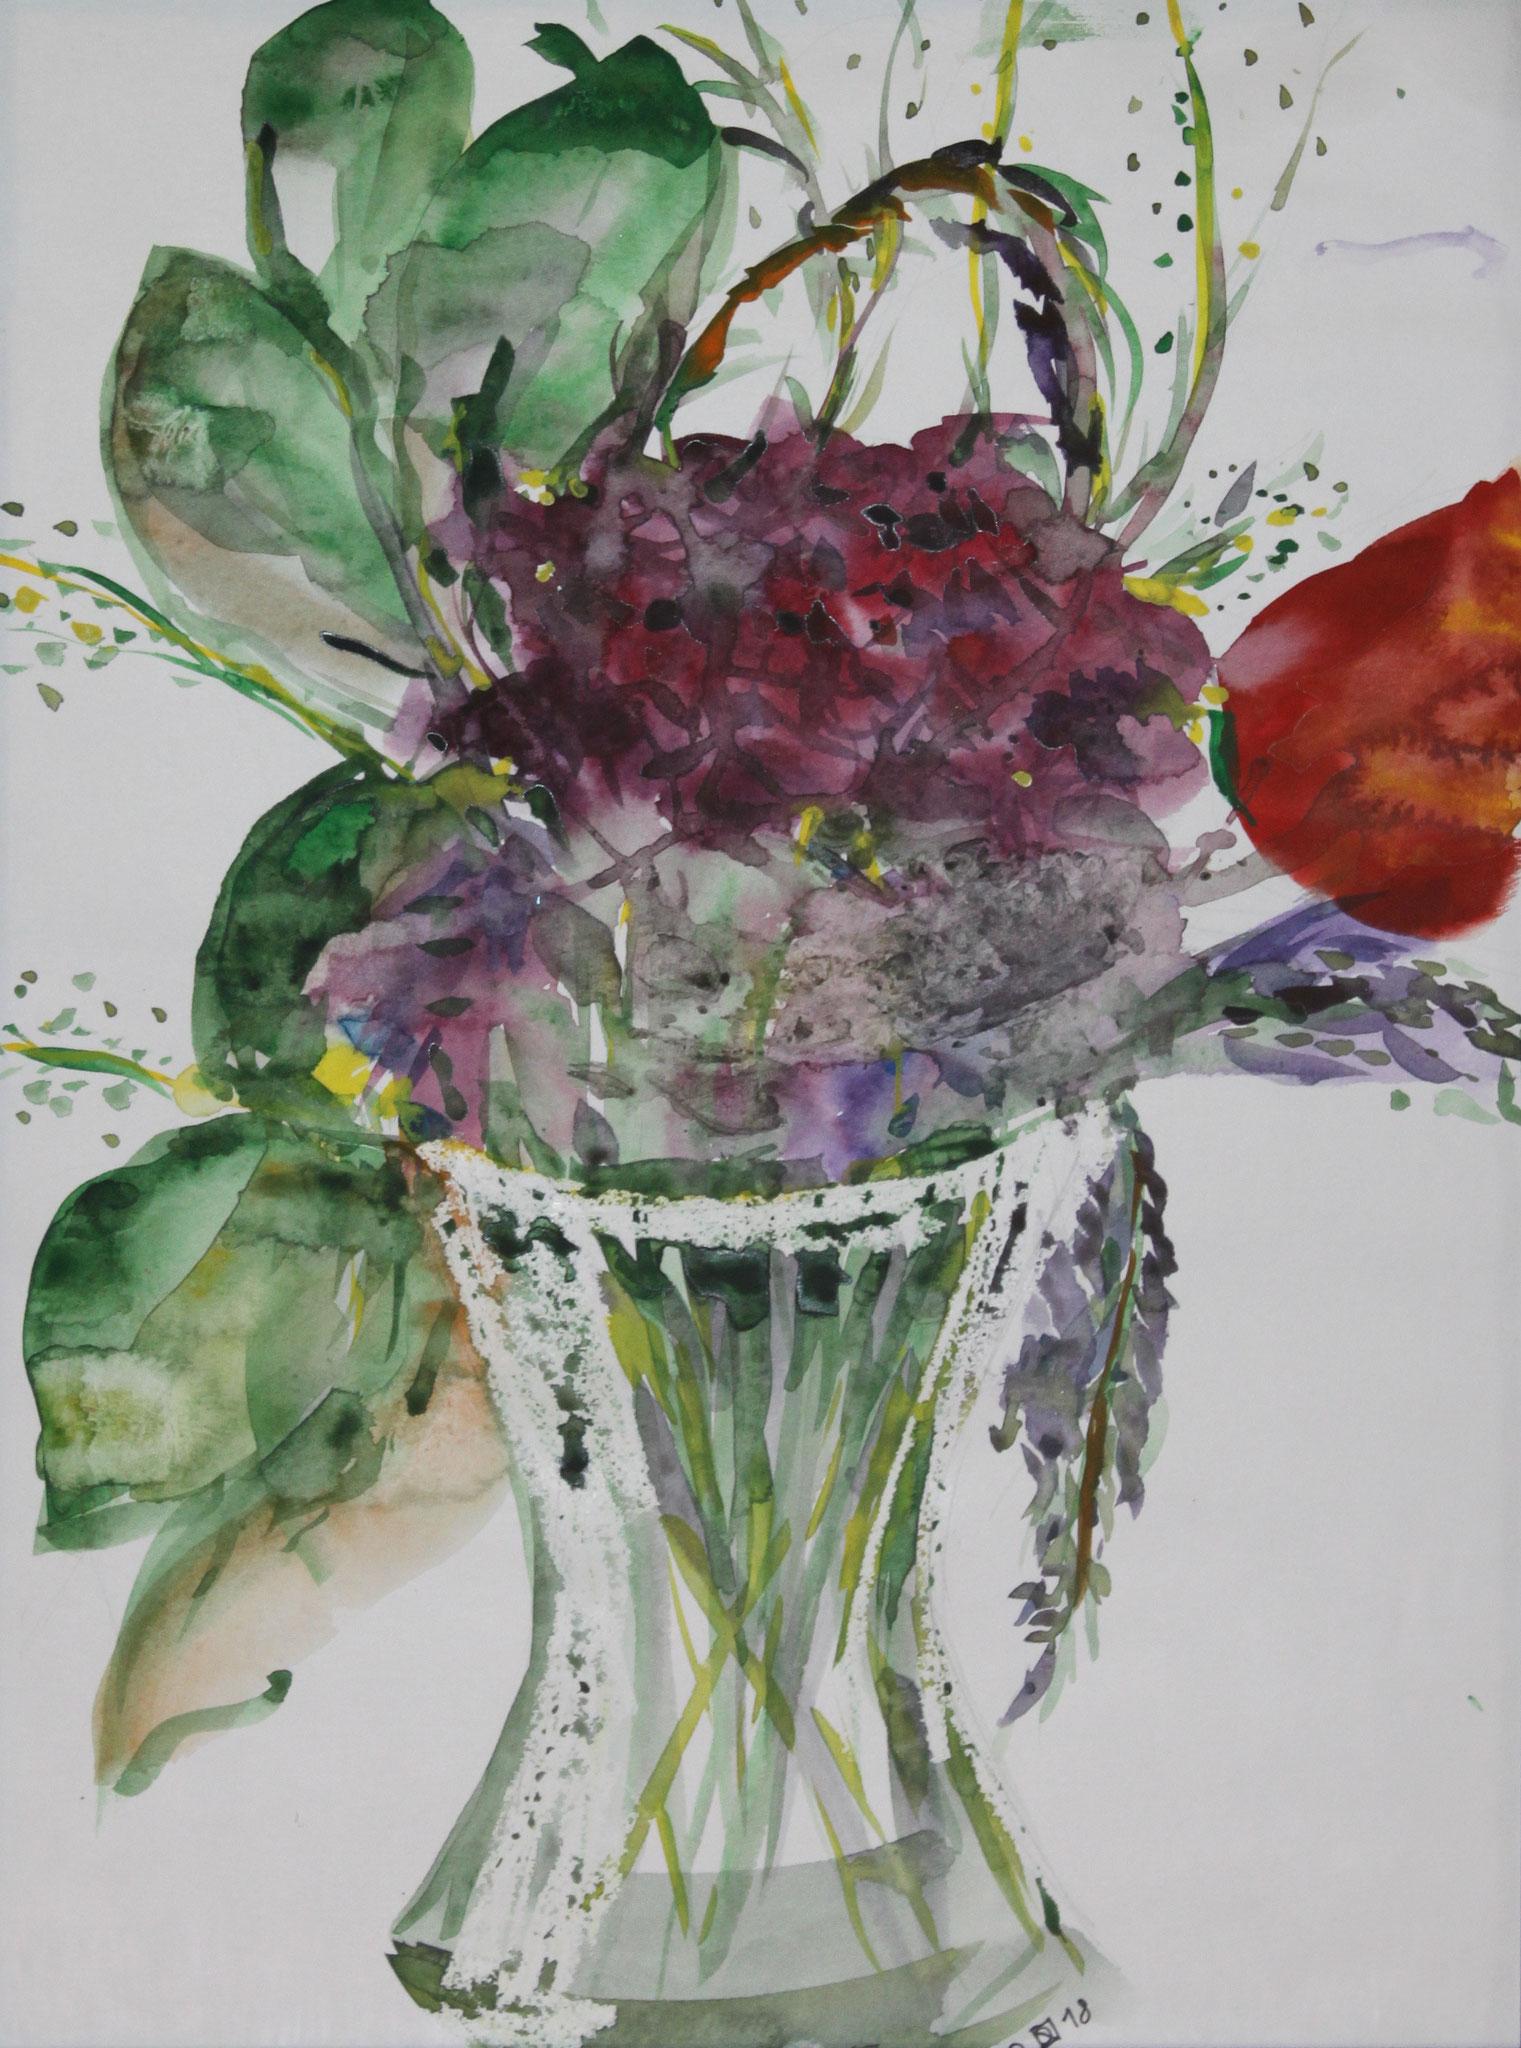 Blauregen, 2018, Gouache und Aquarell auf Papier, 42 cm x 30 cm